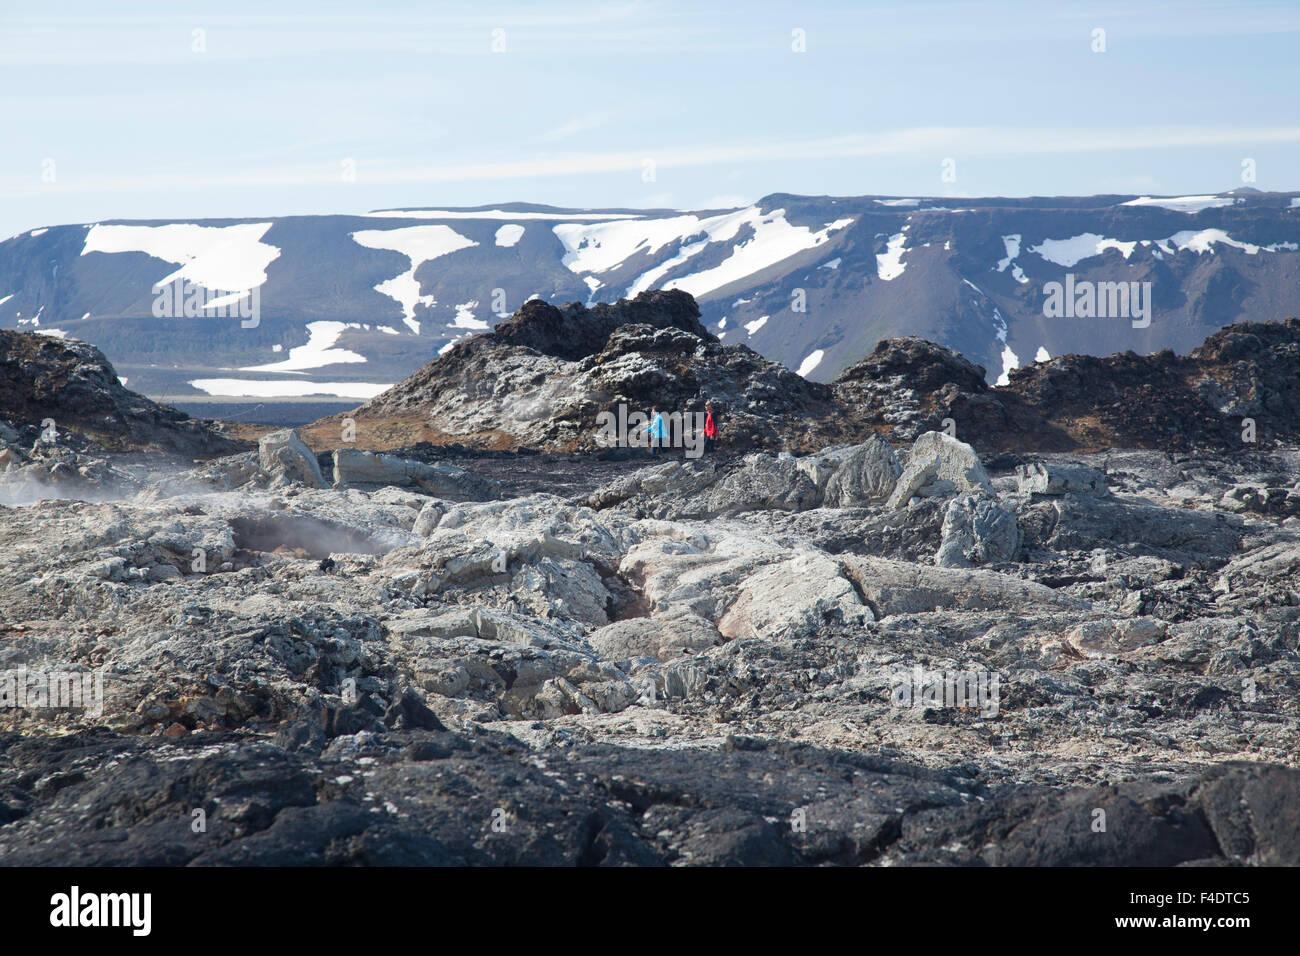 Smouldering lava field at Leirhnjukur, Krafla volcanic area, Myvatn, Nordhurland Eystra, Iceland. - Stock Image